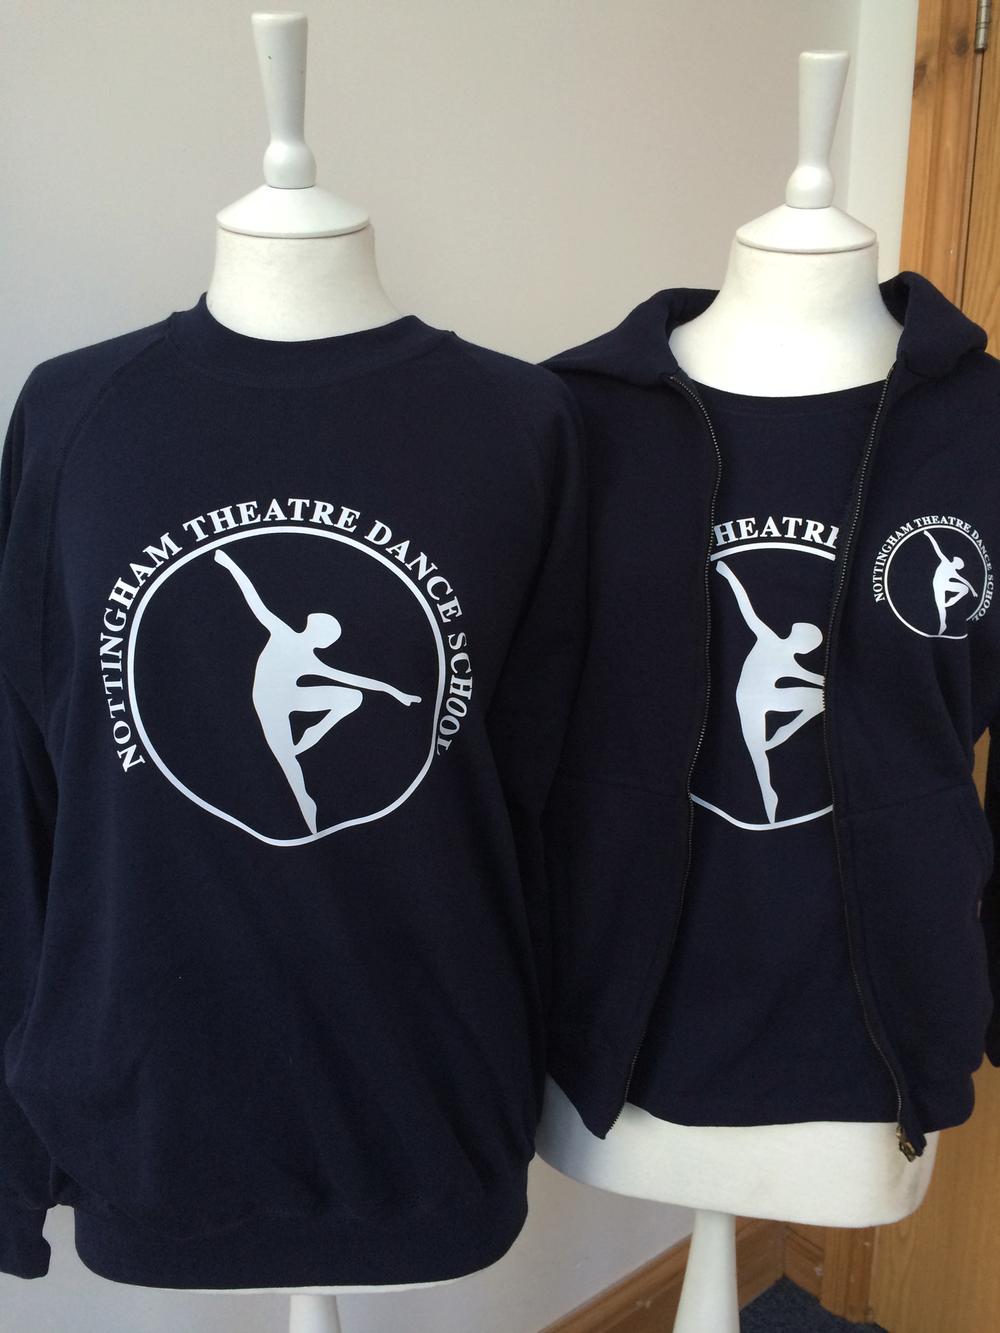 Printed Uniform for Nottingham Theatre Dance School